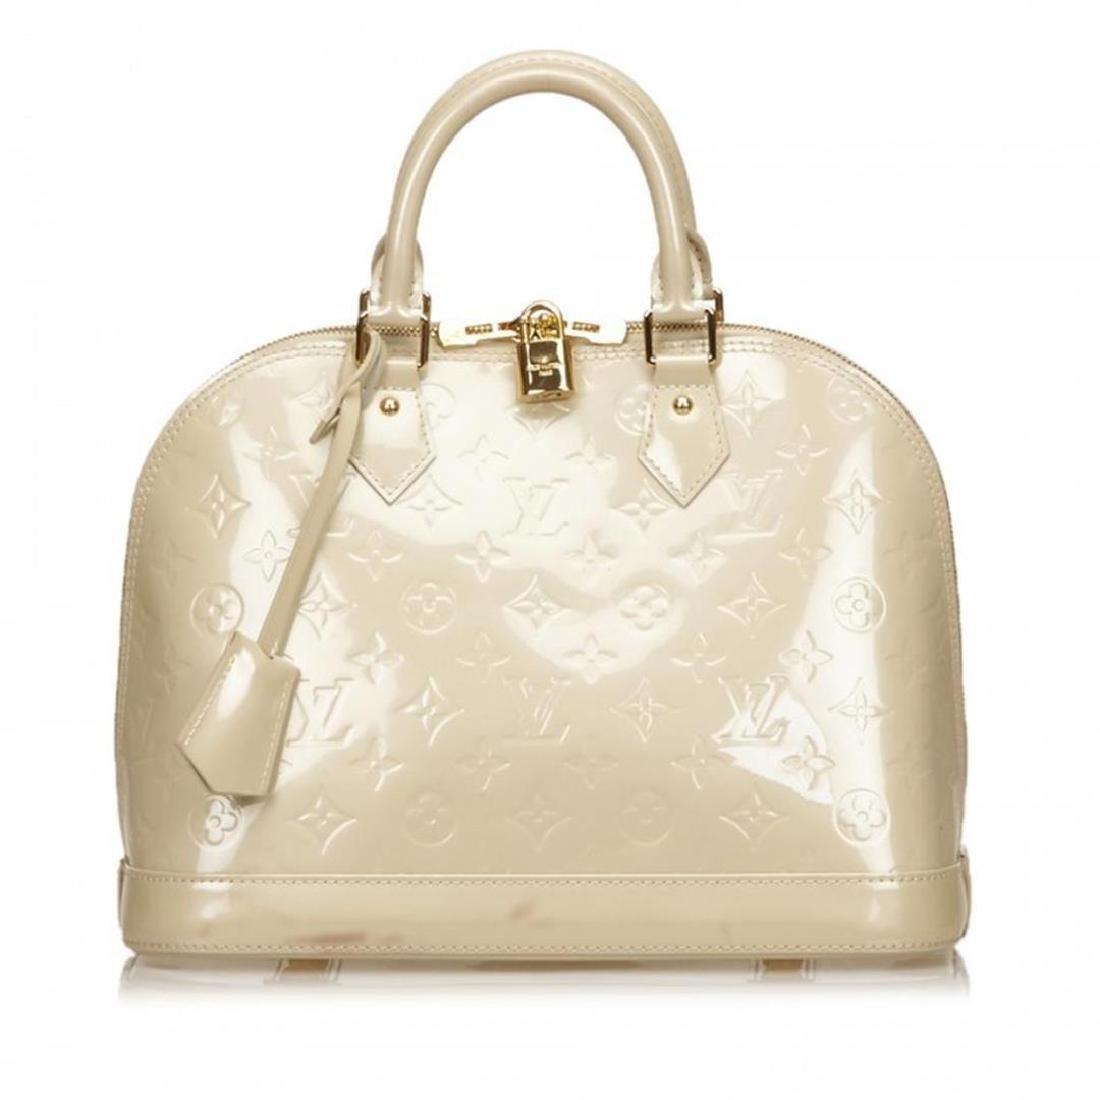 Louis Vuitton Off White Pearl Vernis Monogram Alma PM